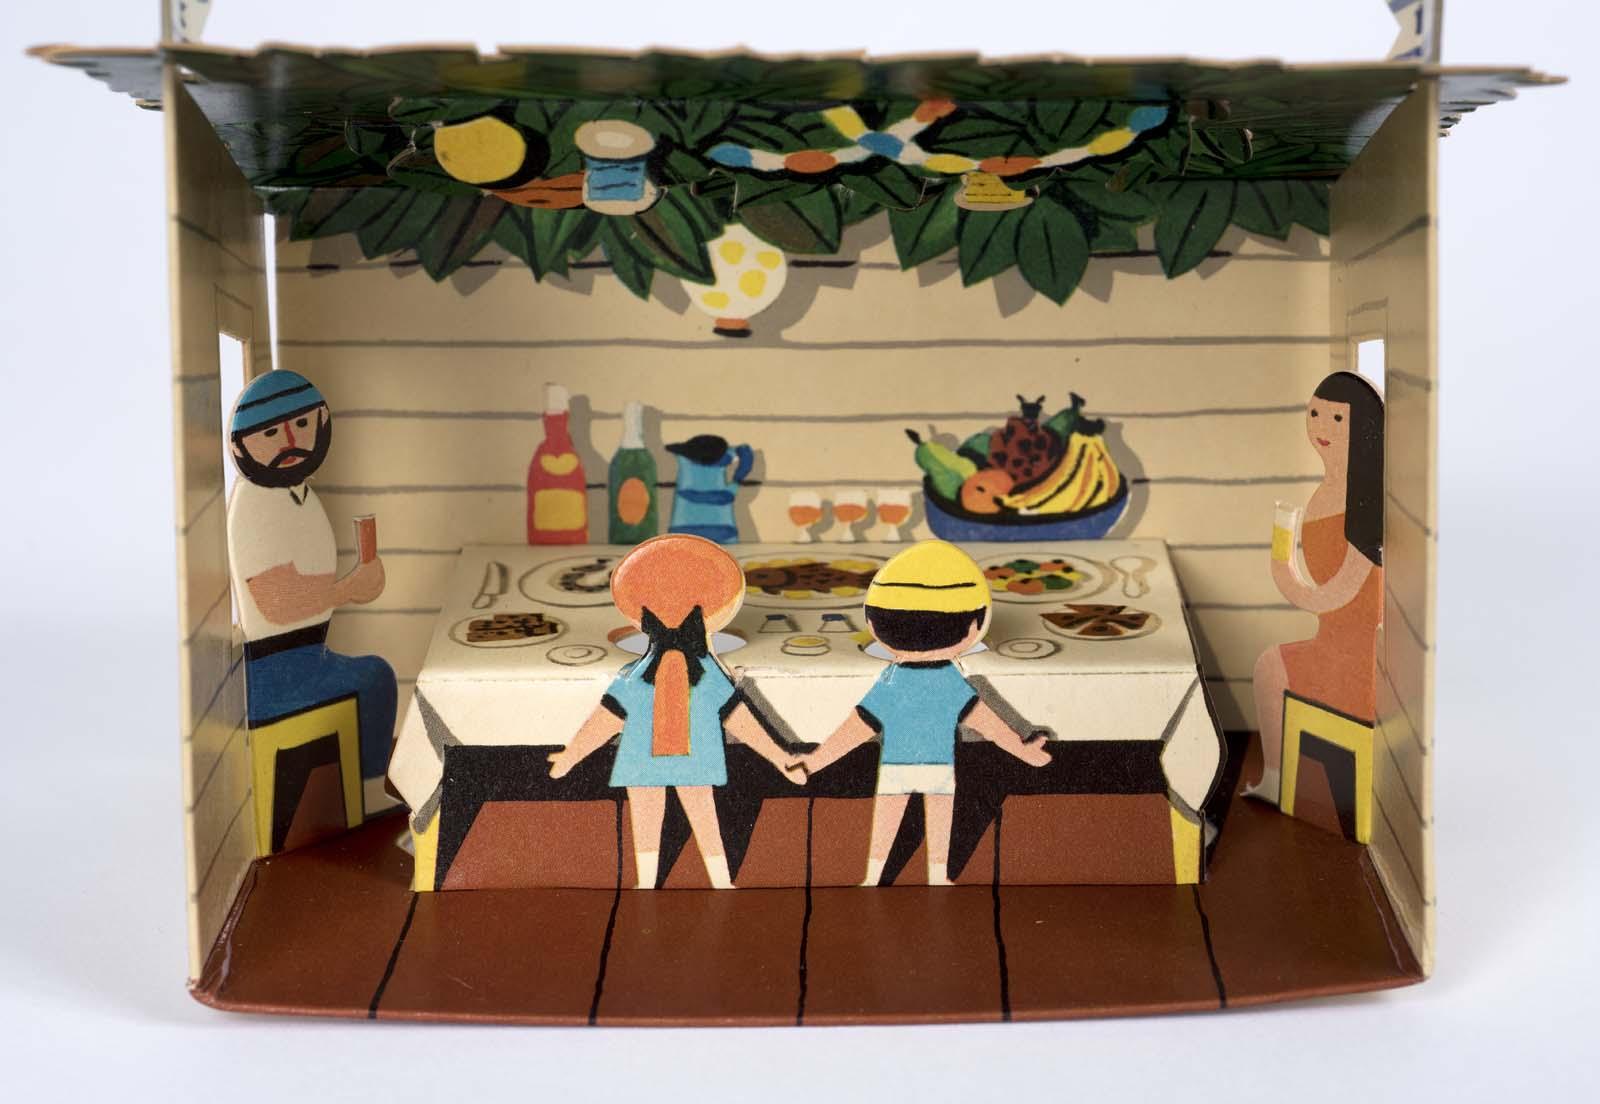 a cardbaord diorama showing a family eating a feast